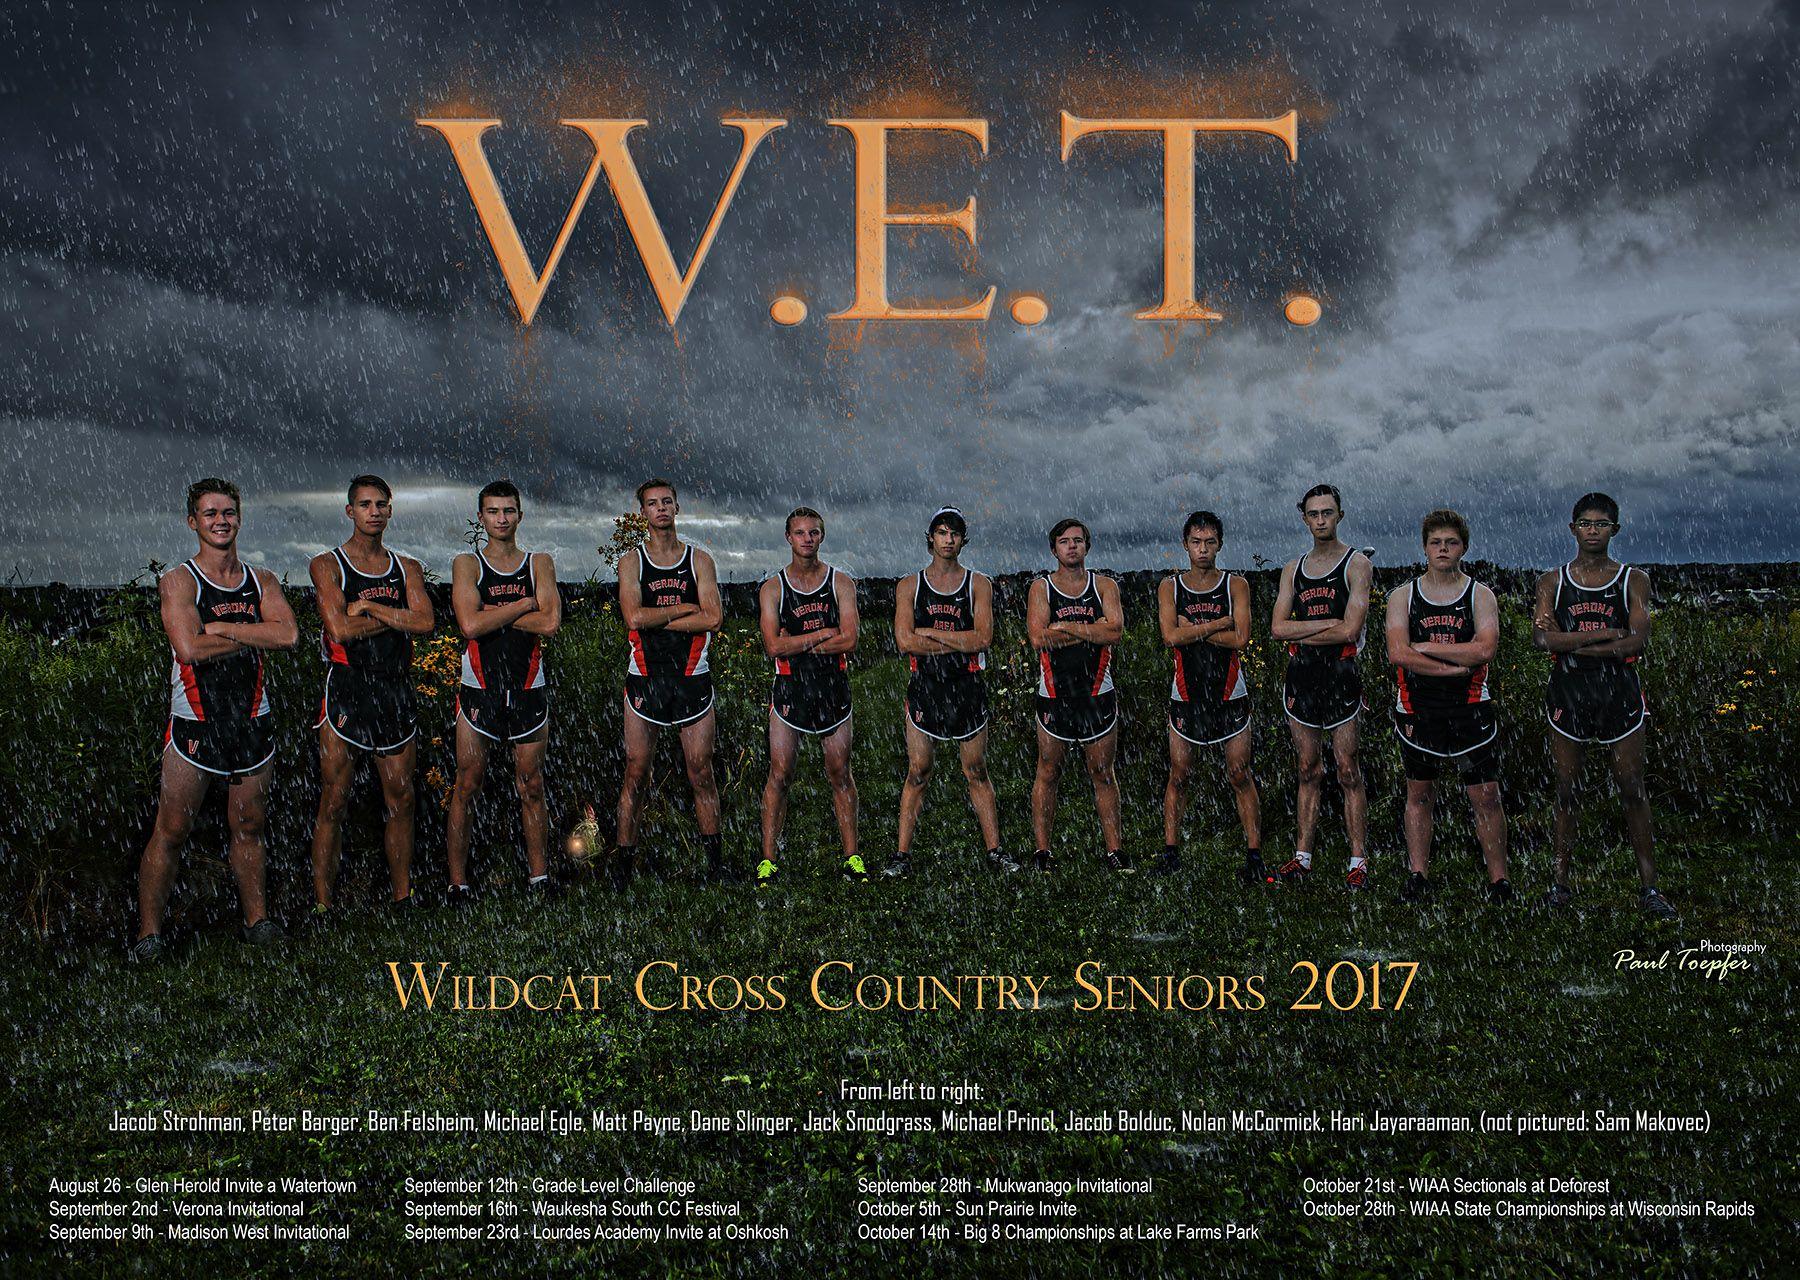 Cross Country Sport Team Poster School Sports Posters Groups Poster High School Cross Country